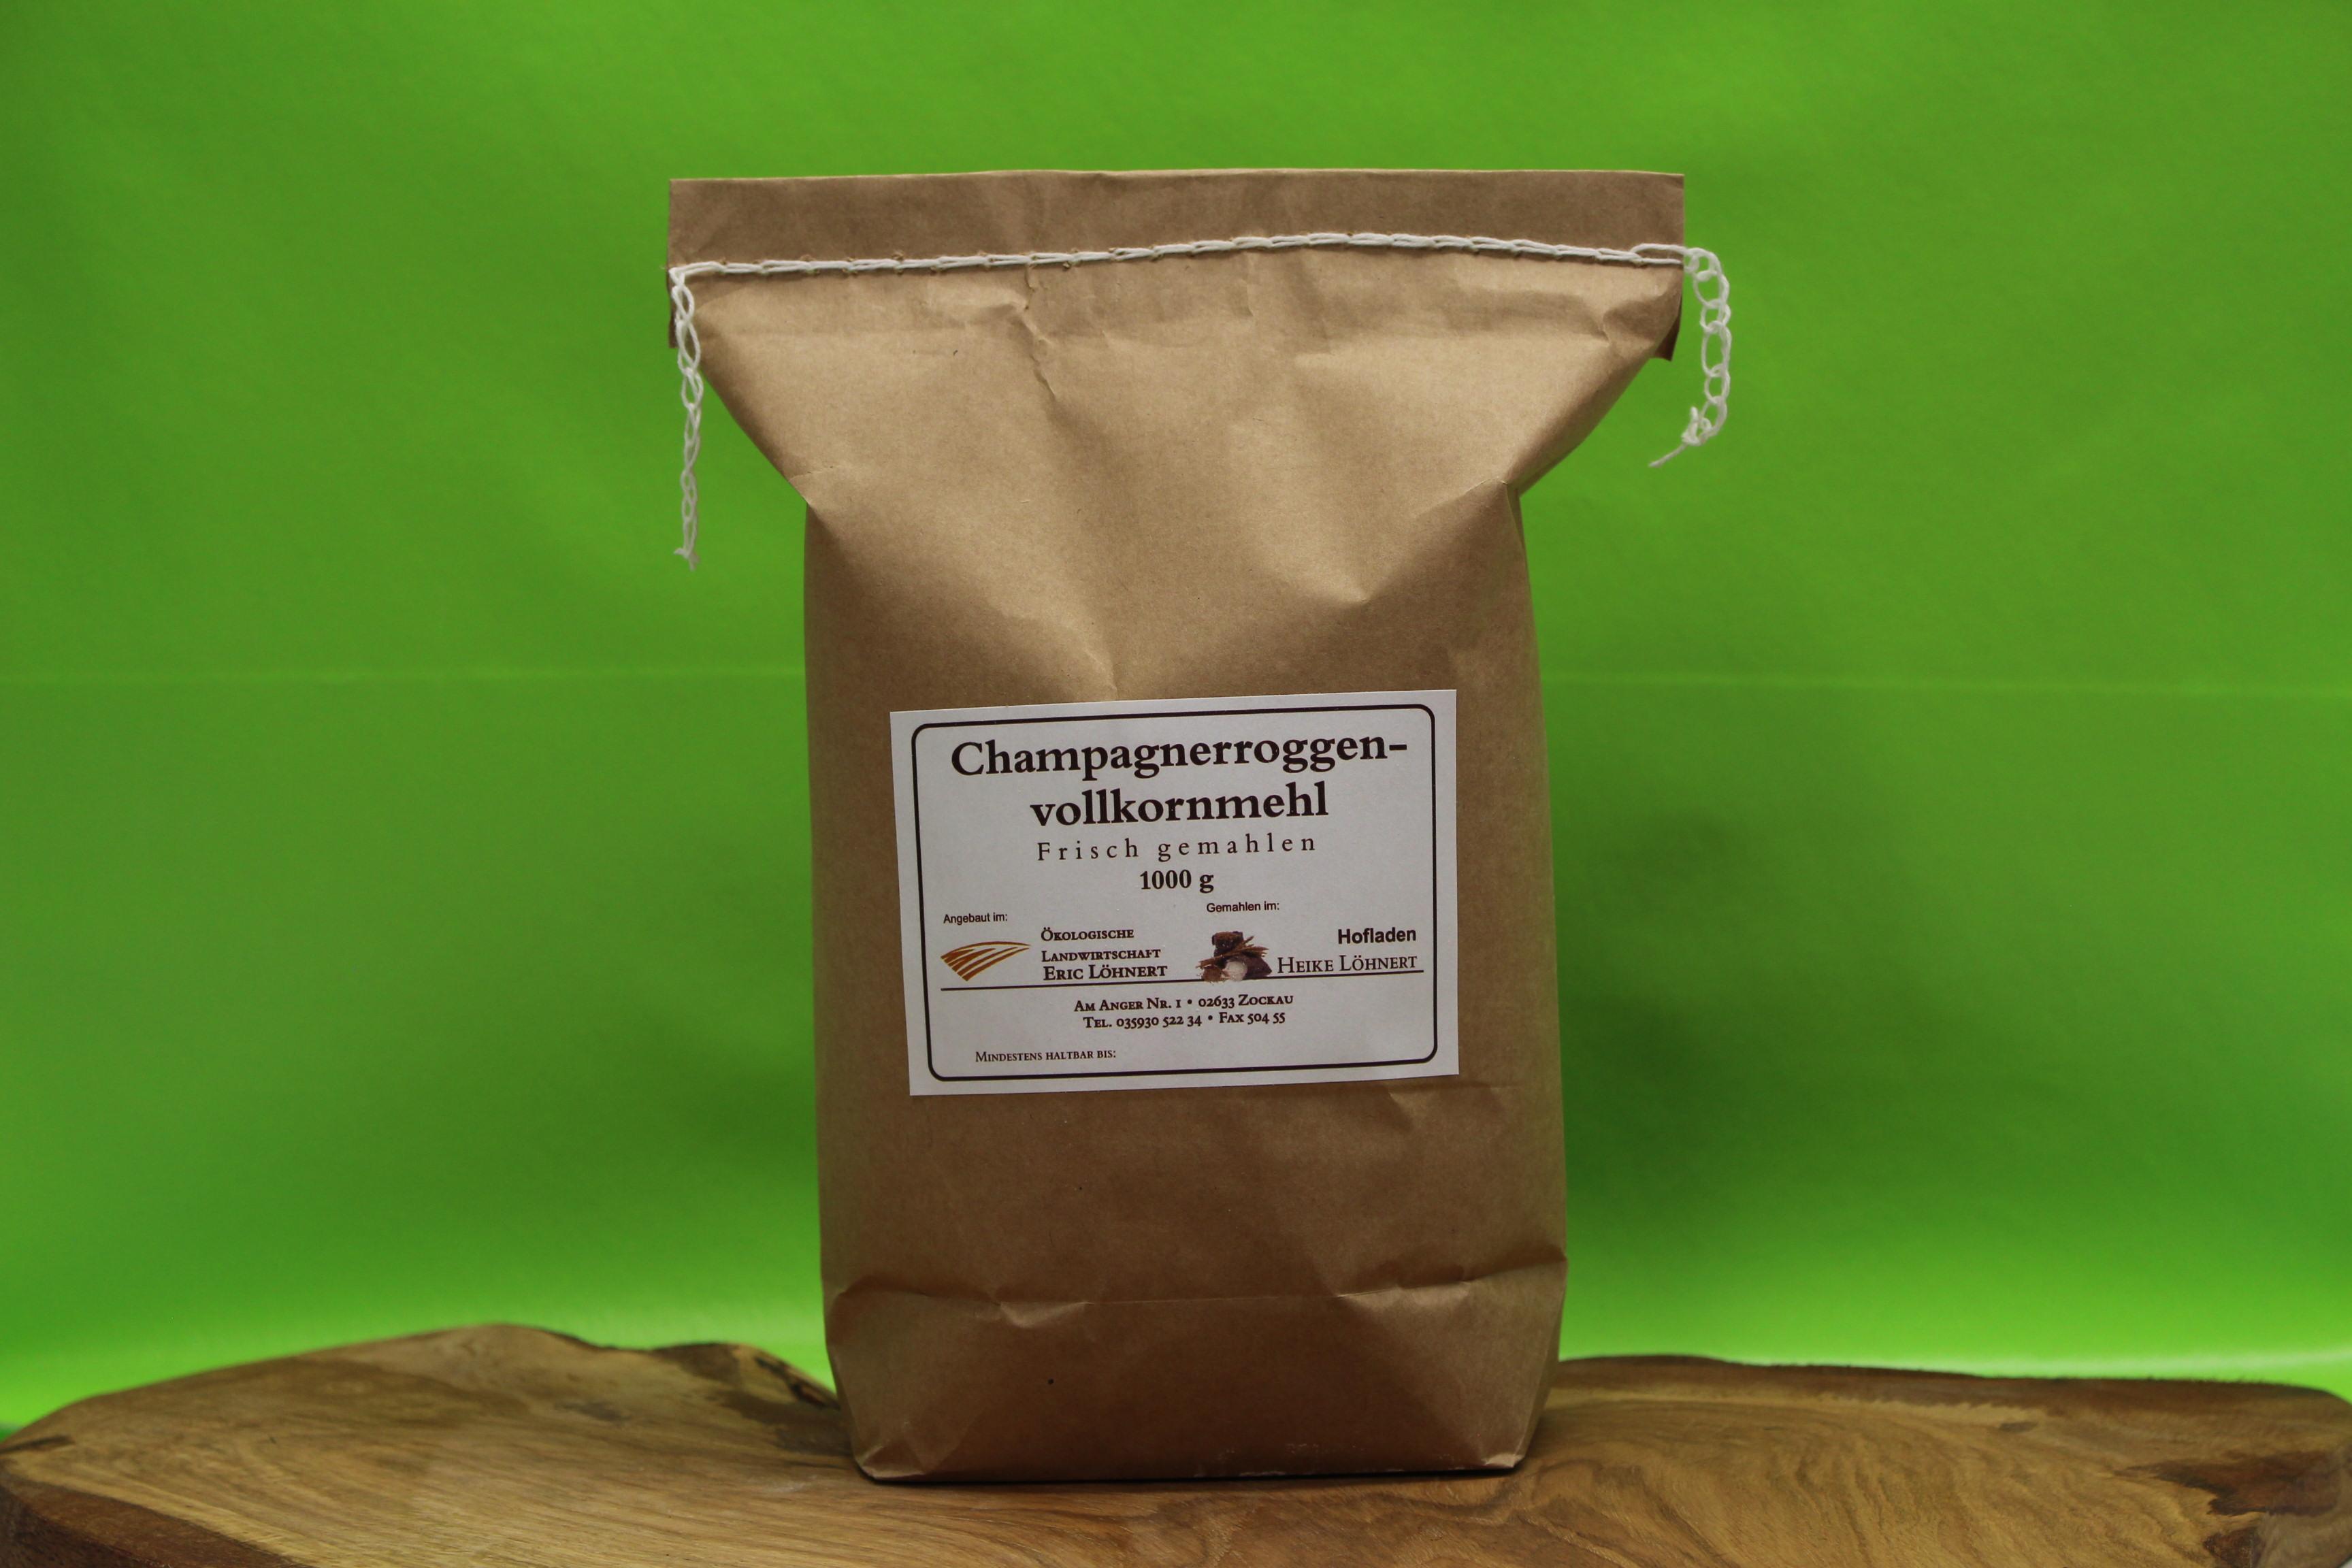 Champagnerroggenvollkornmehl